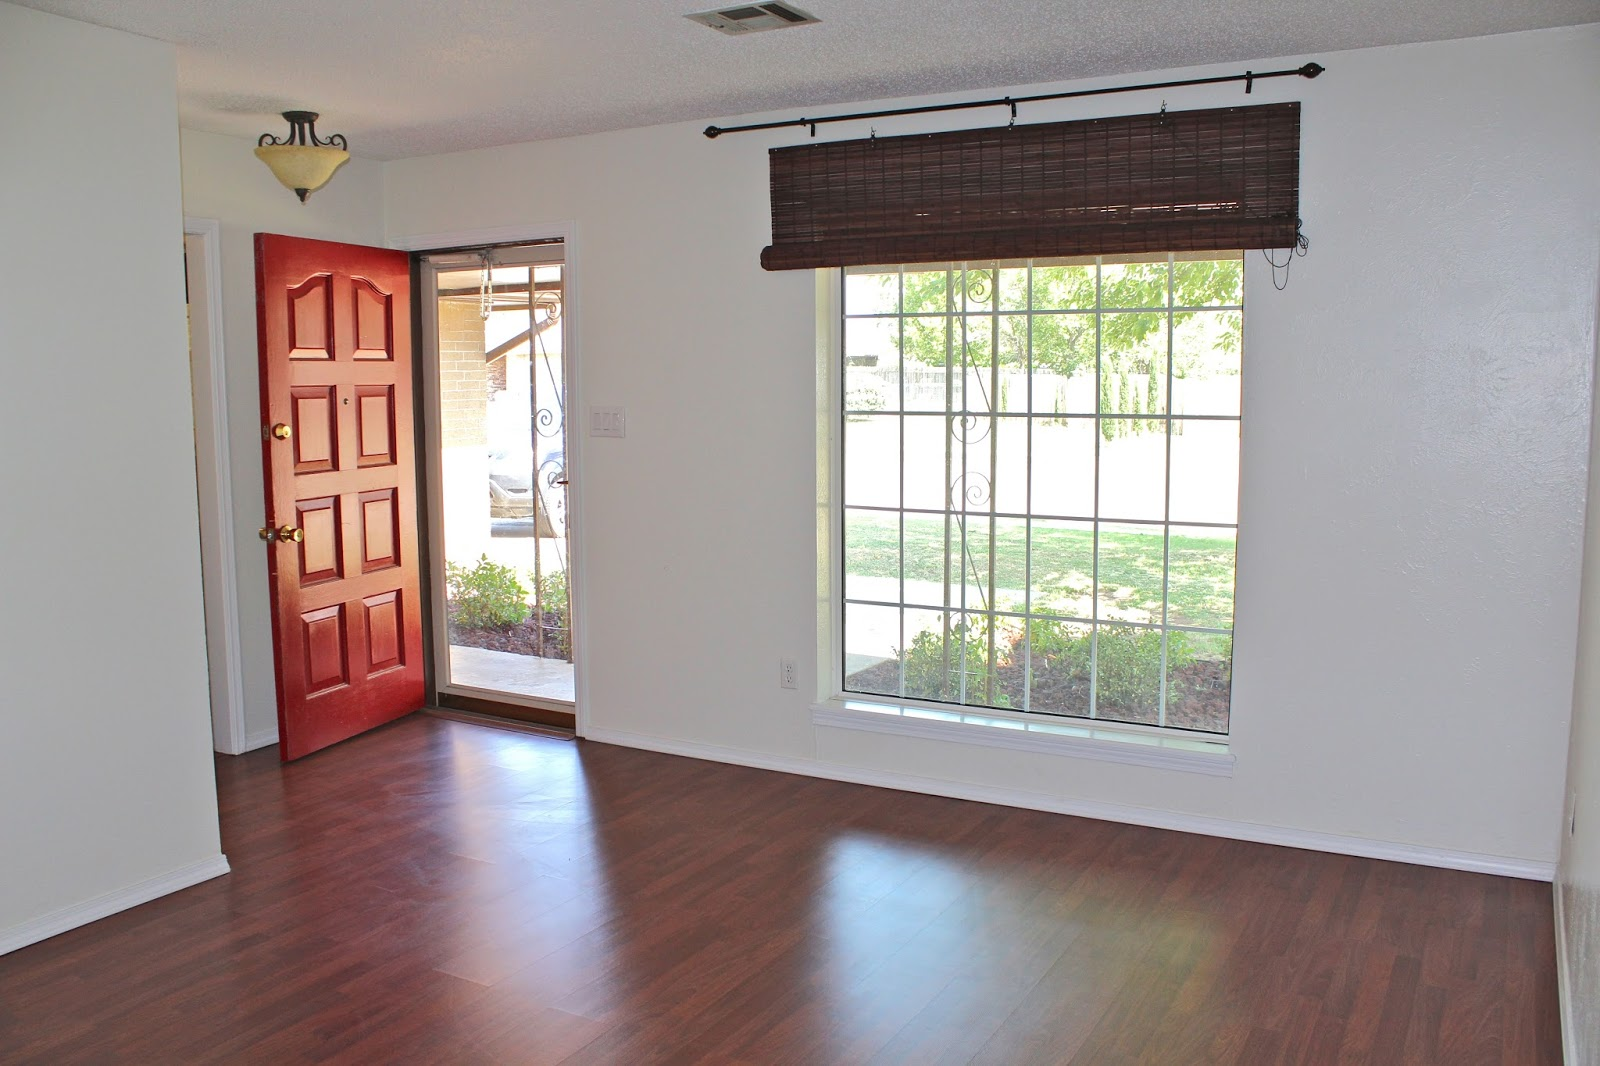 living room and kitchen tour emma marie designs. Black Bedroom Furniture Sets. Home Design Ideas